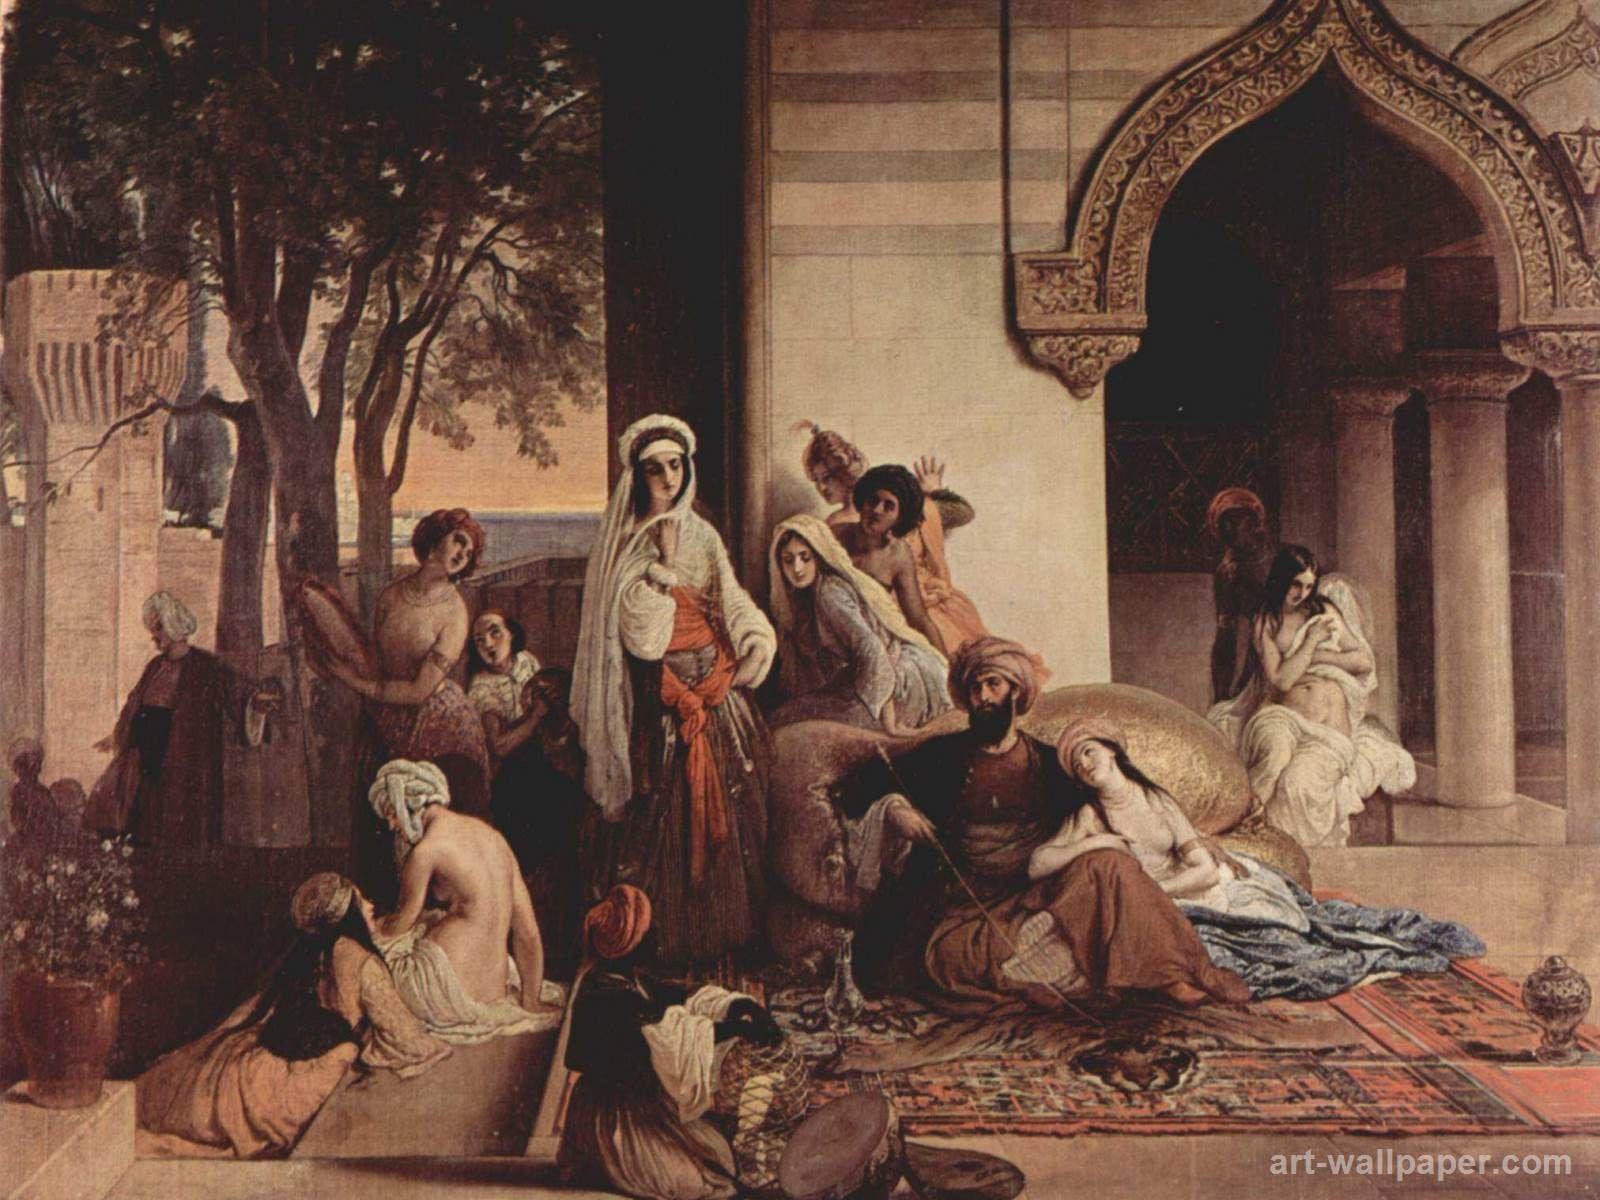 The new favorite (Harem scene), 1866 Francesco Hayez